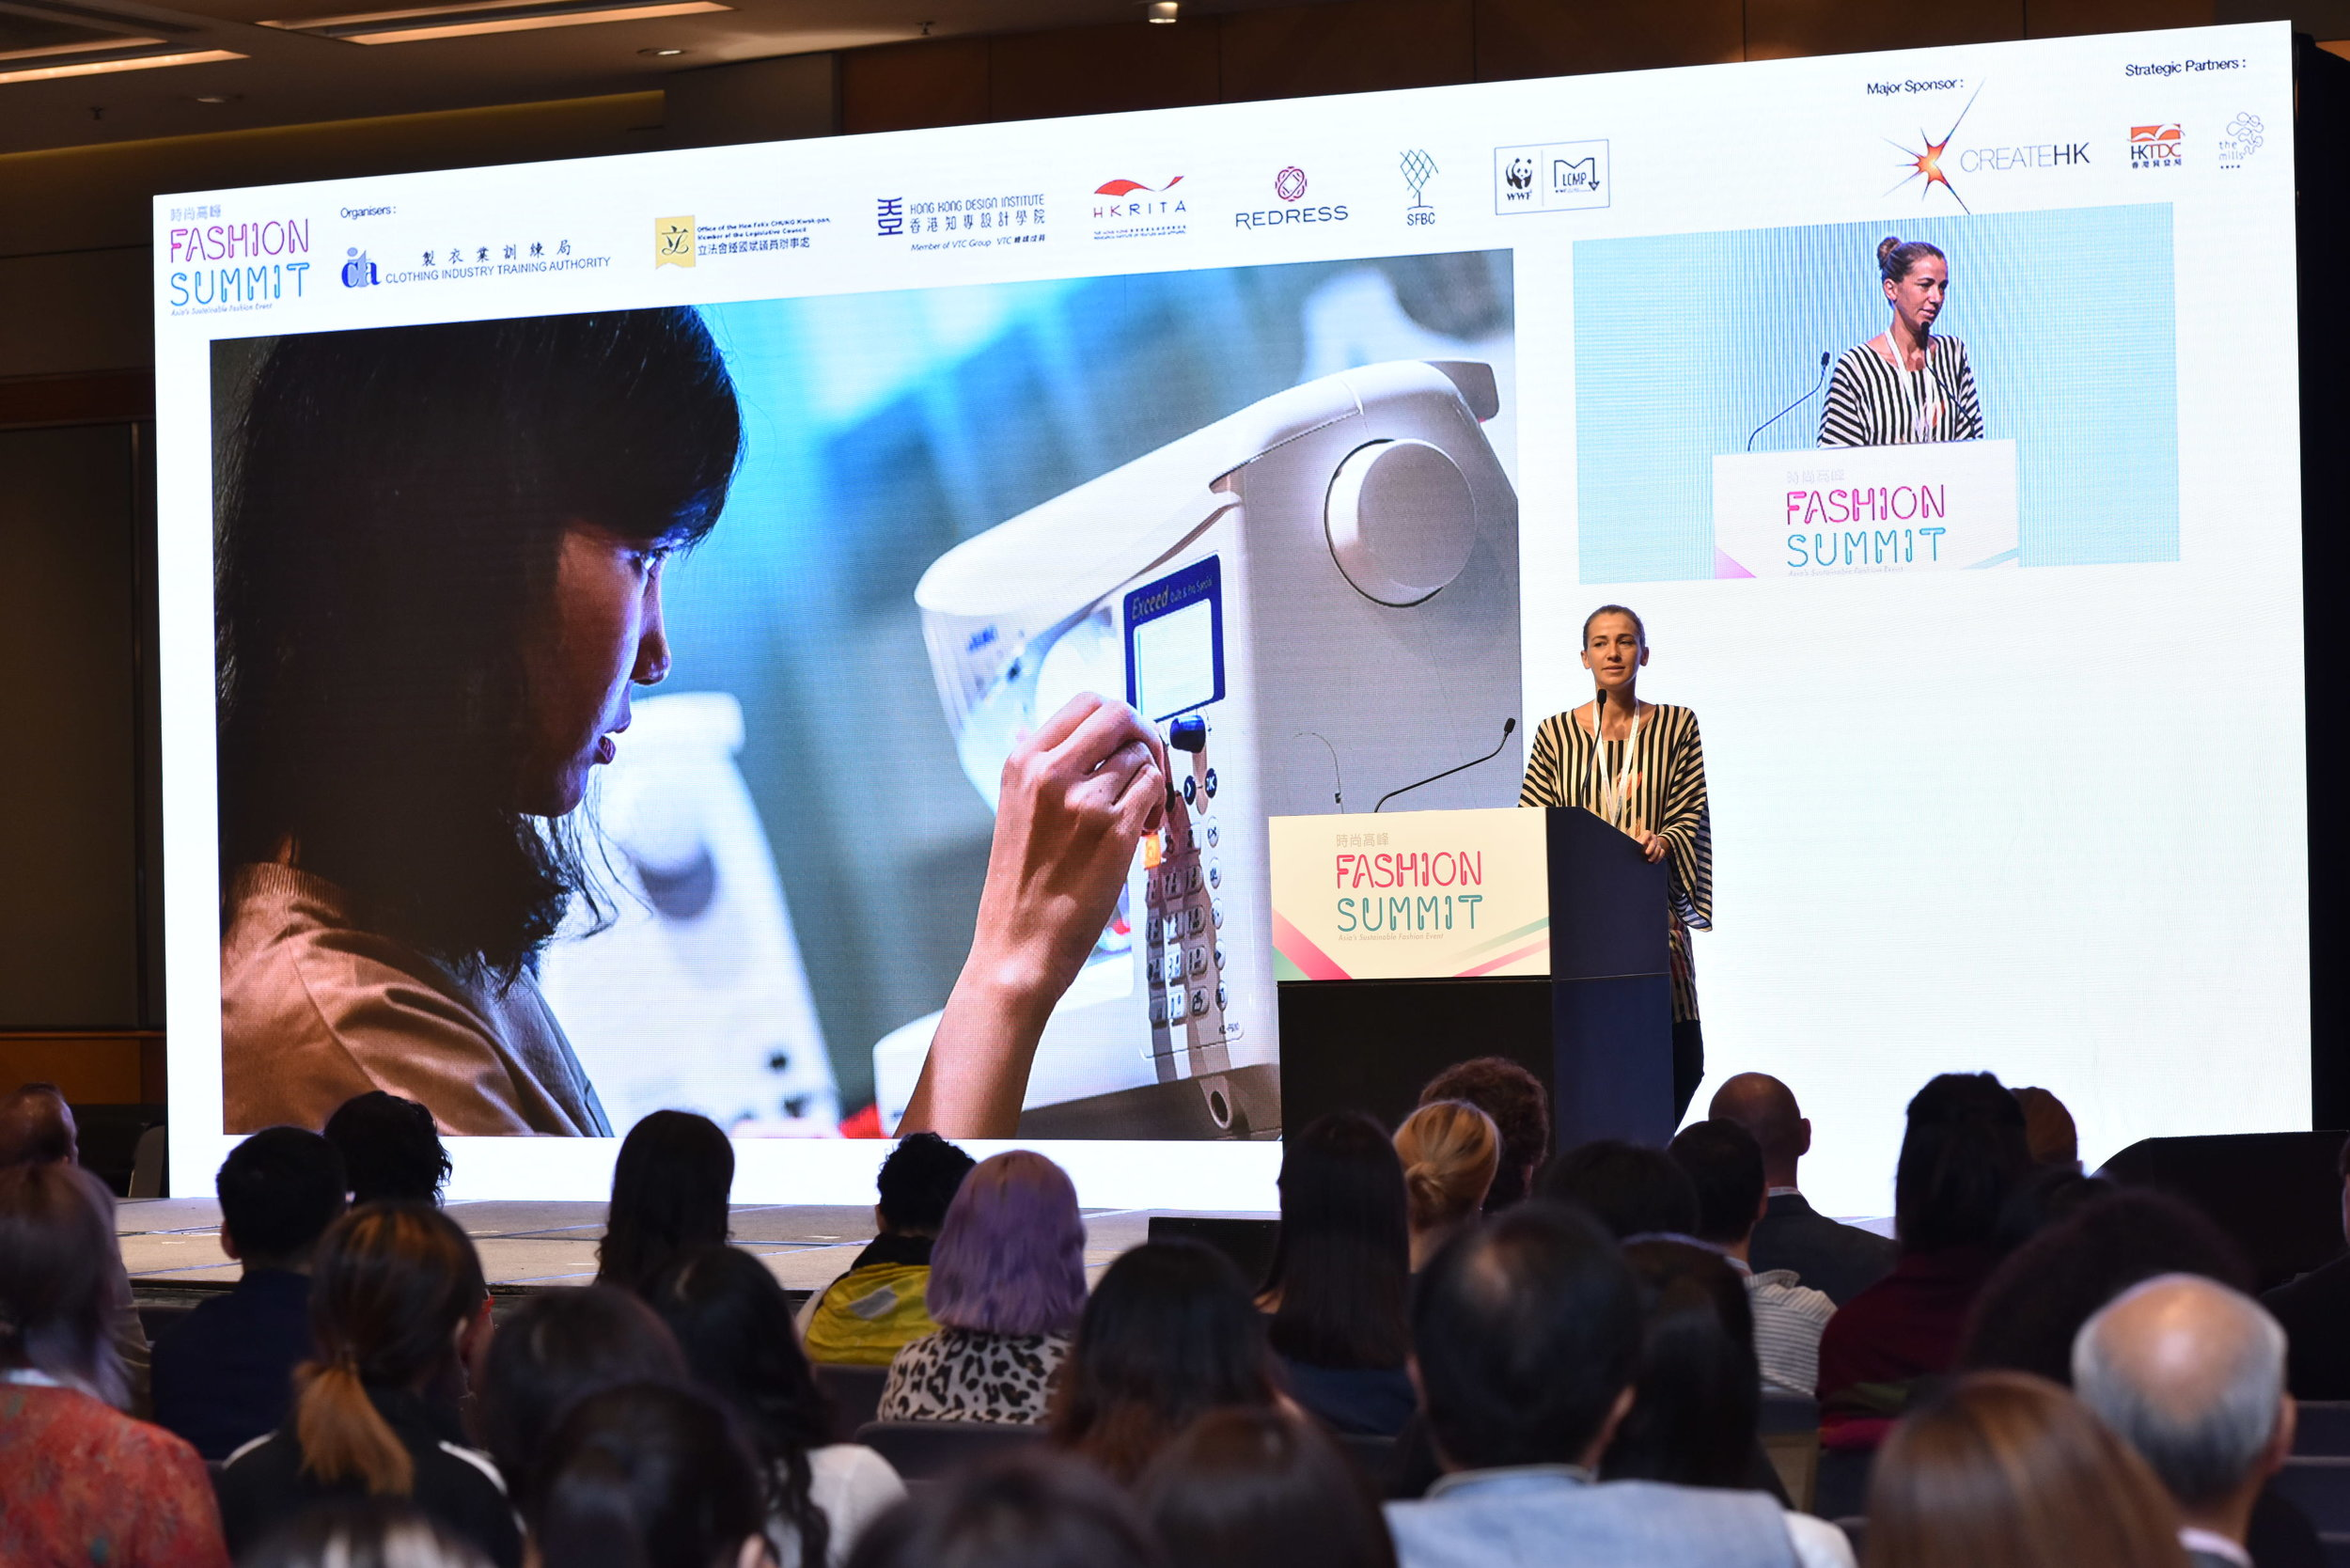 Keynote Speaker I - Equipping Designers